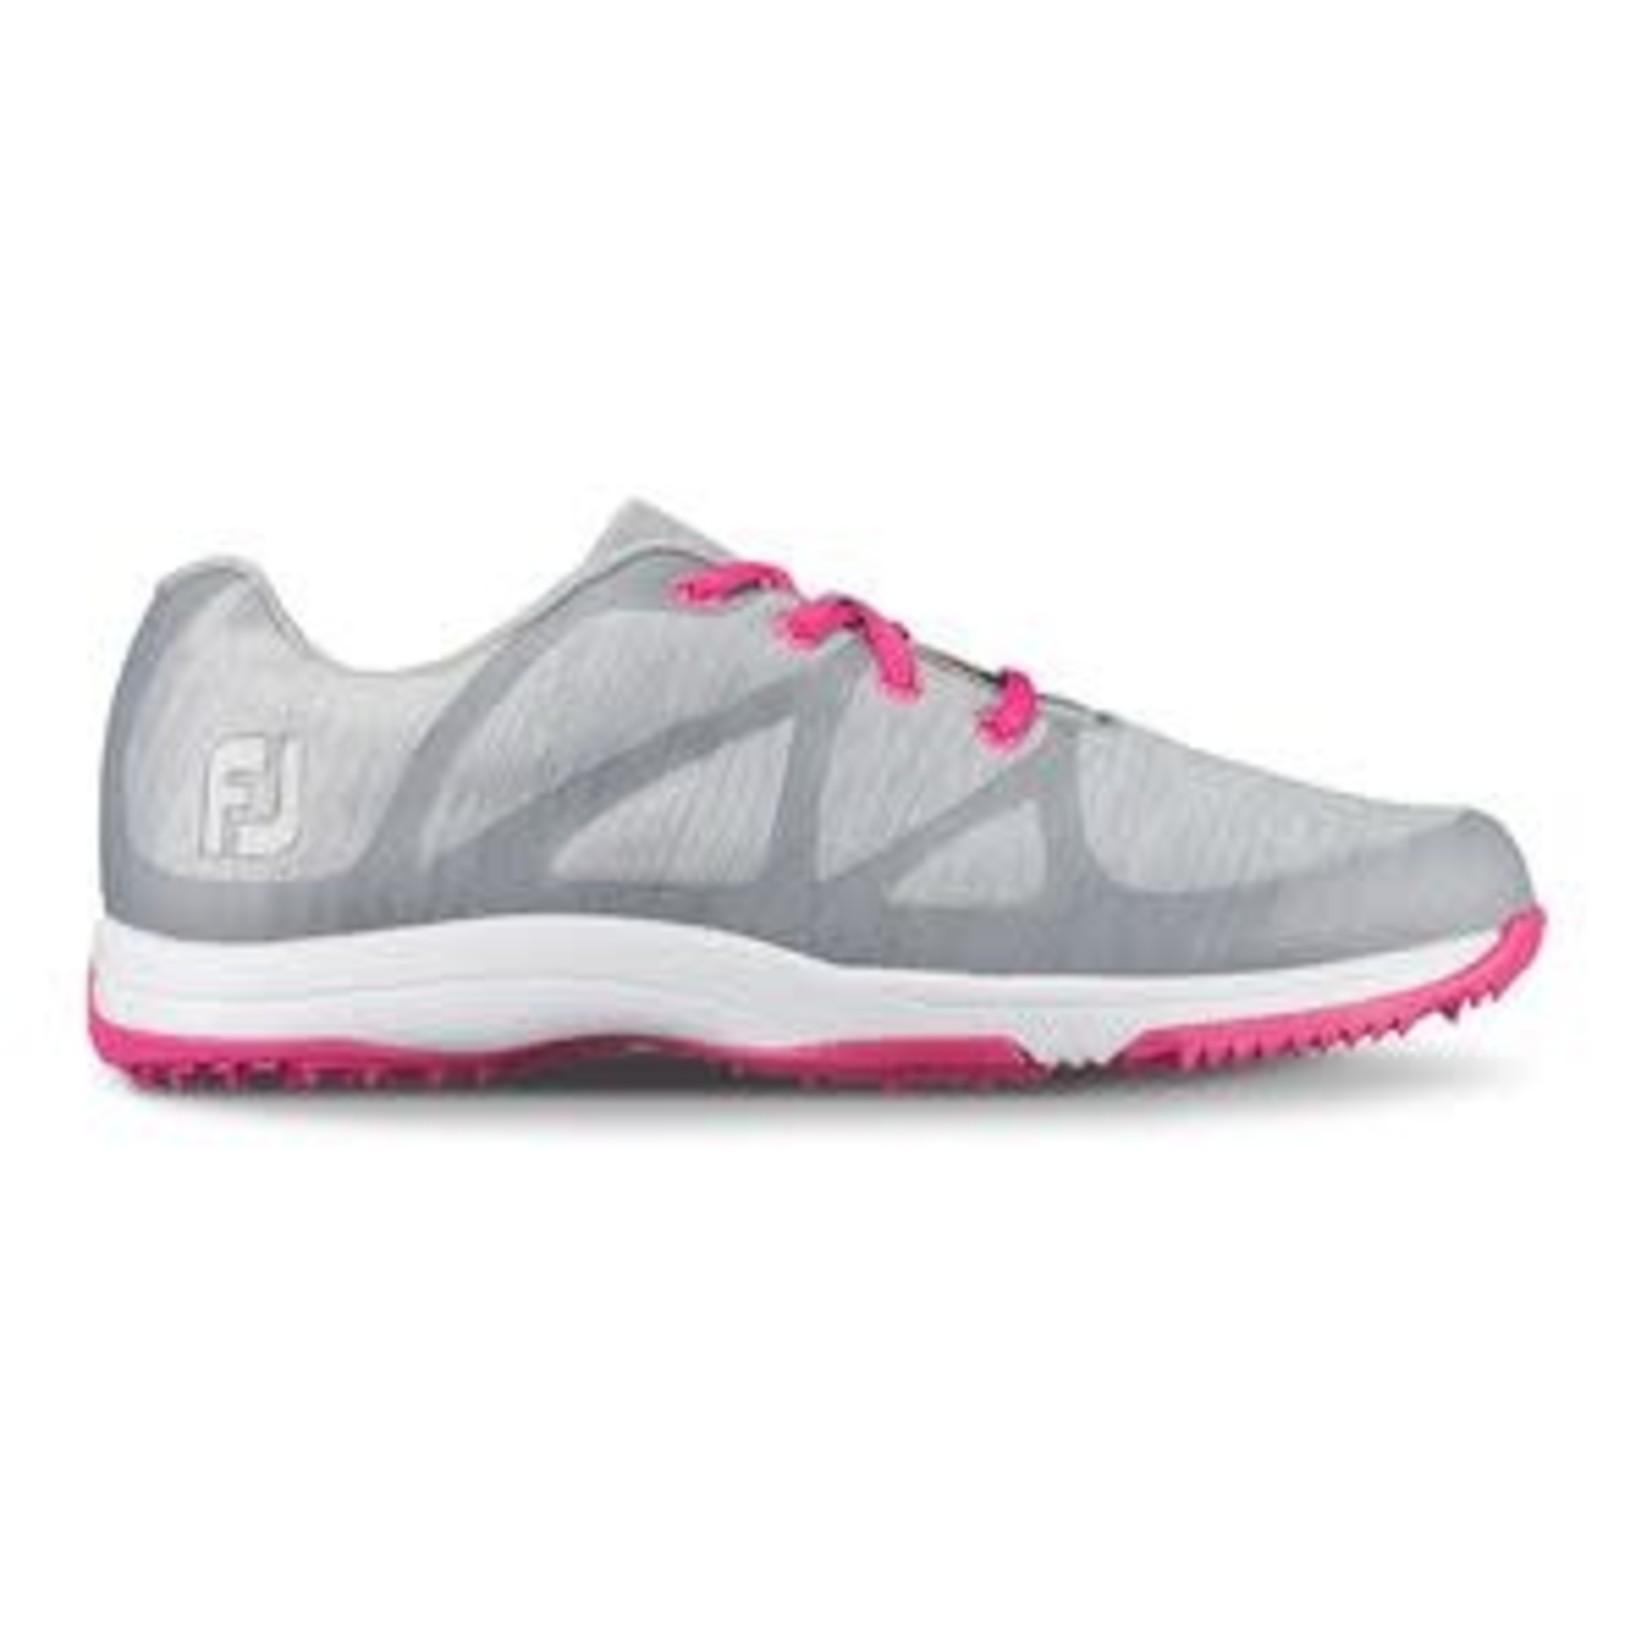 Footjoy FJ Wmns Leisure Spkls Shoe